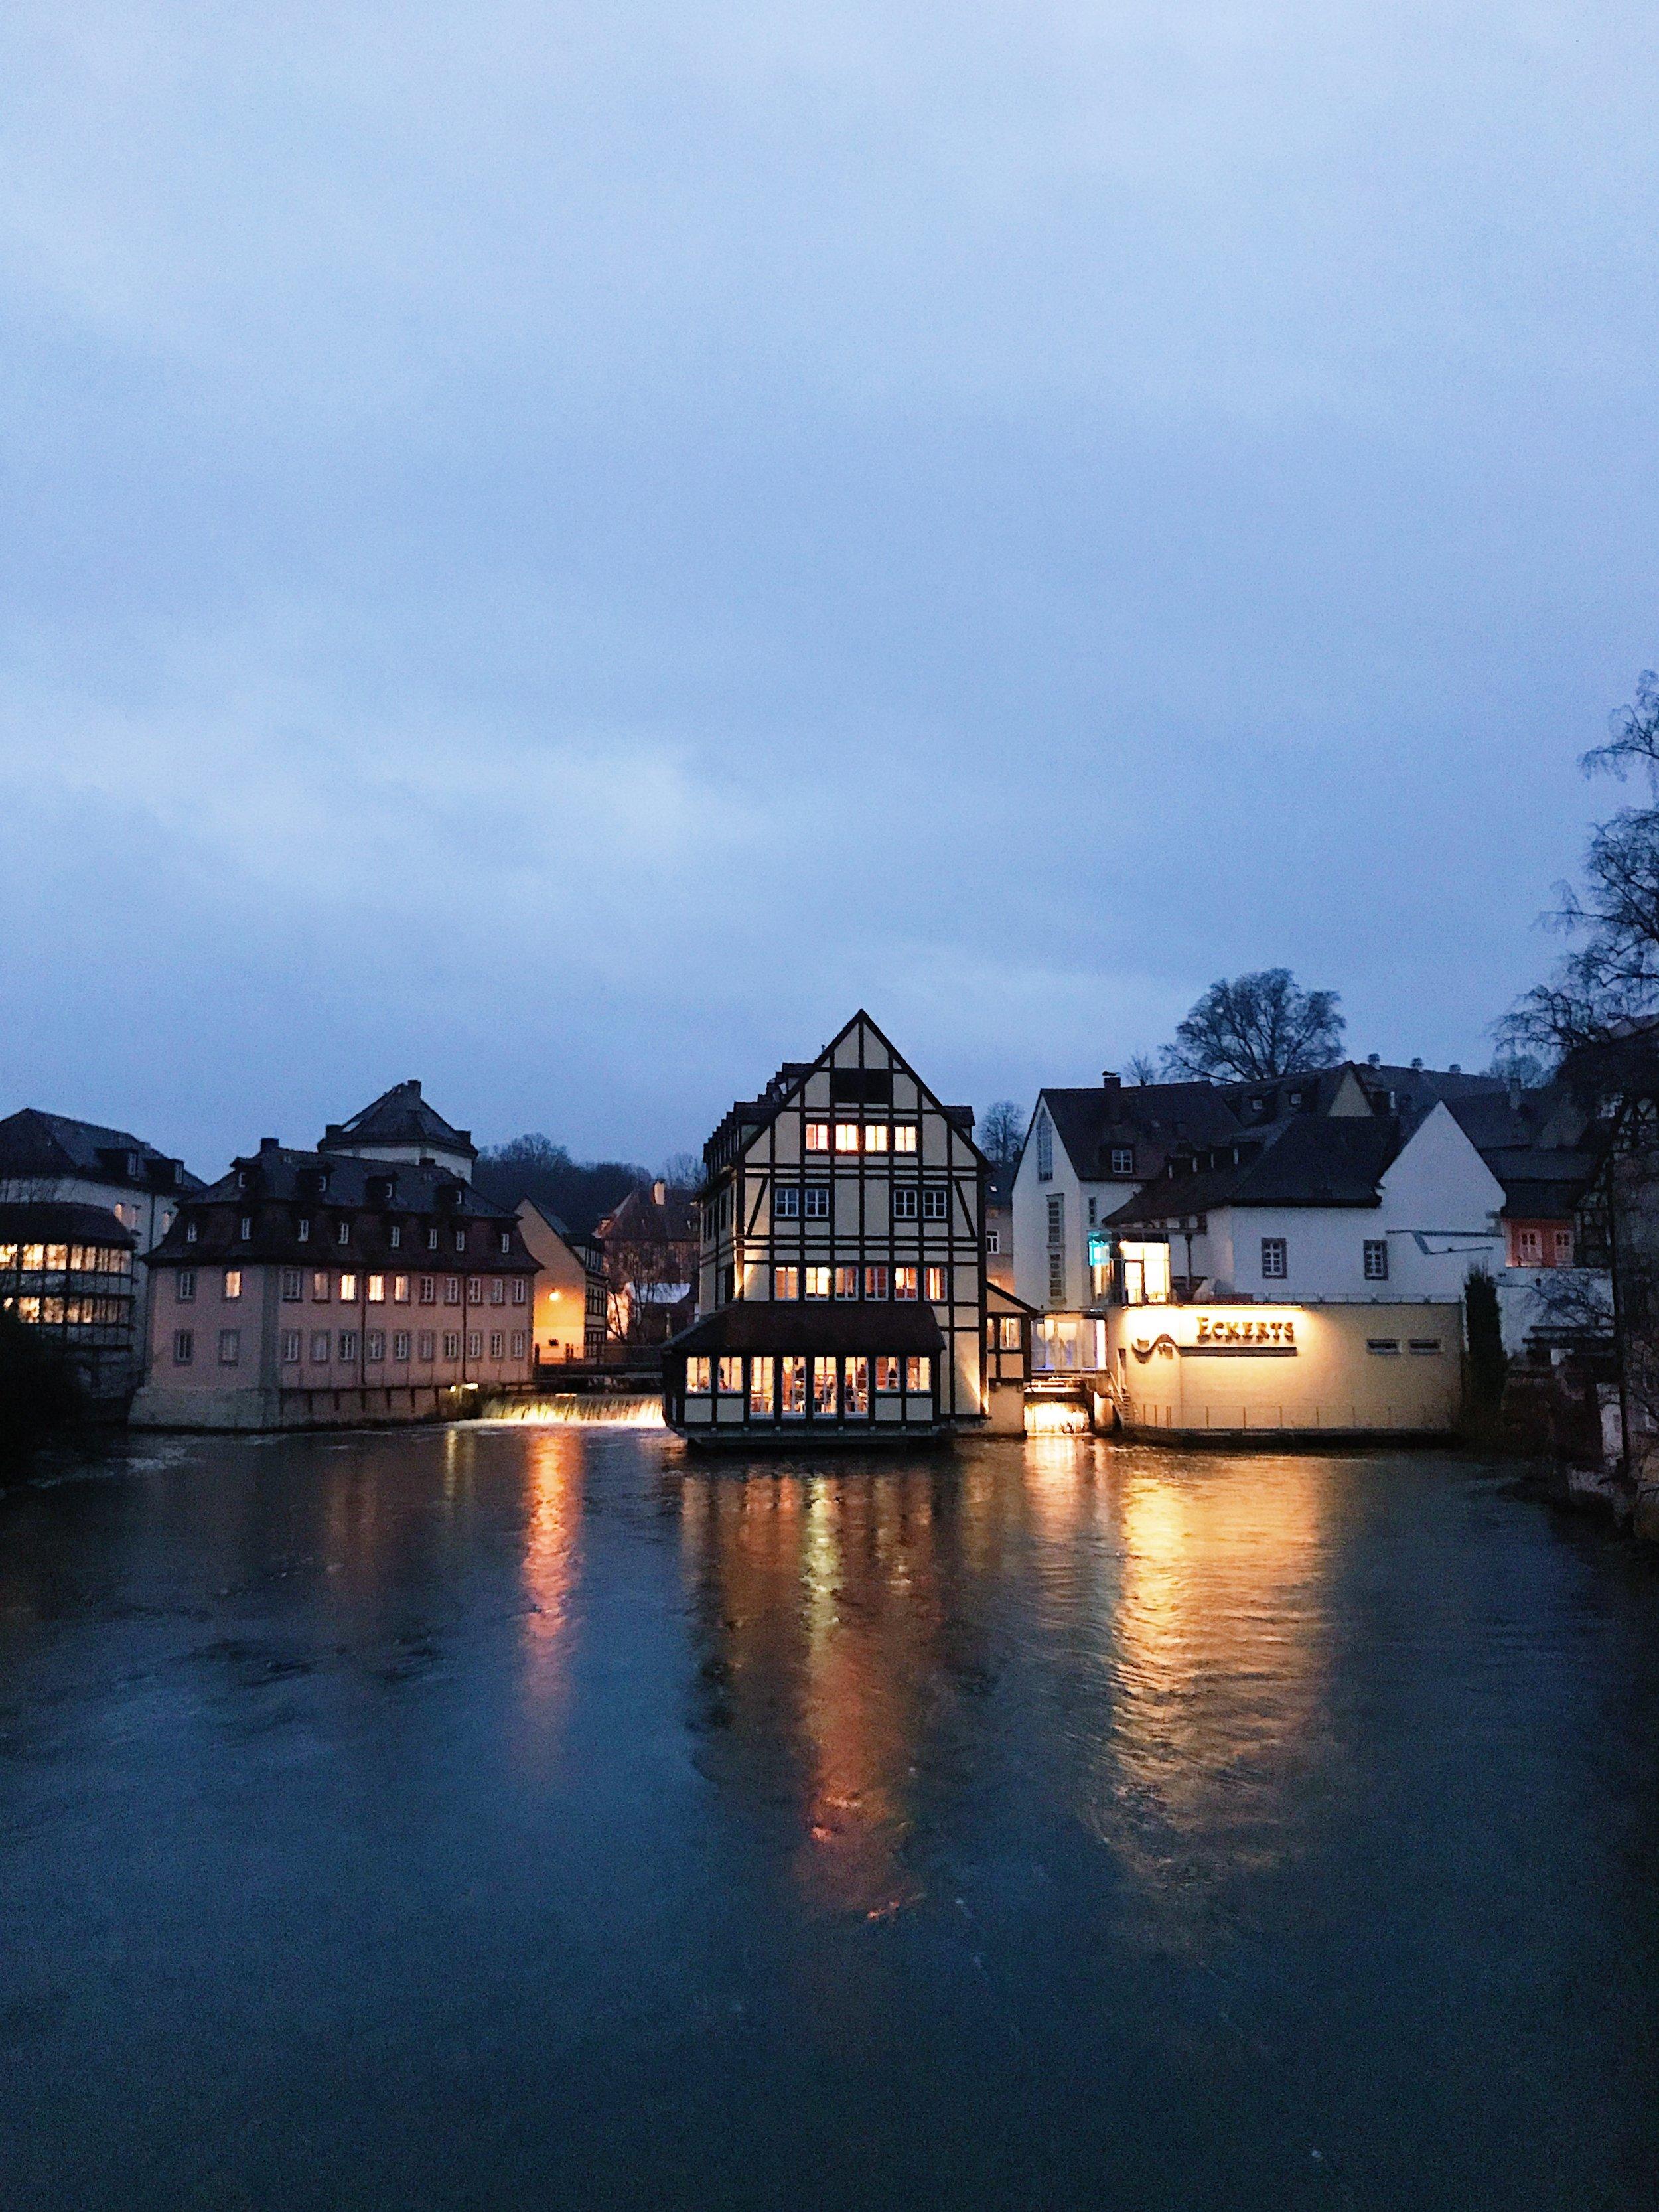 Das Eckerts restaurant in Bamberg, Germany.